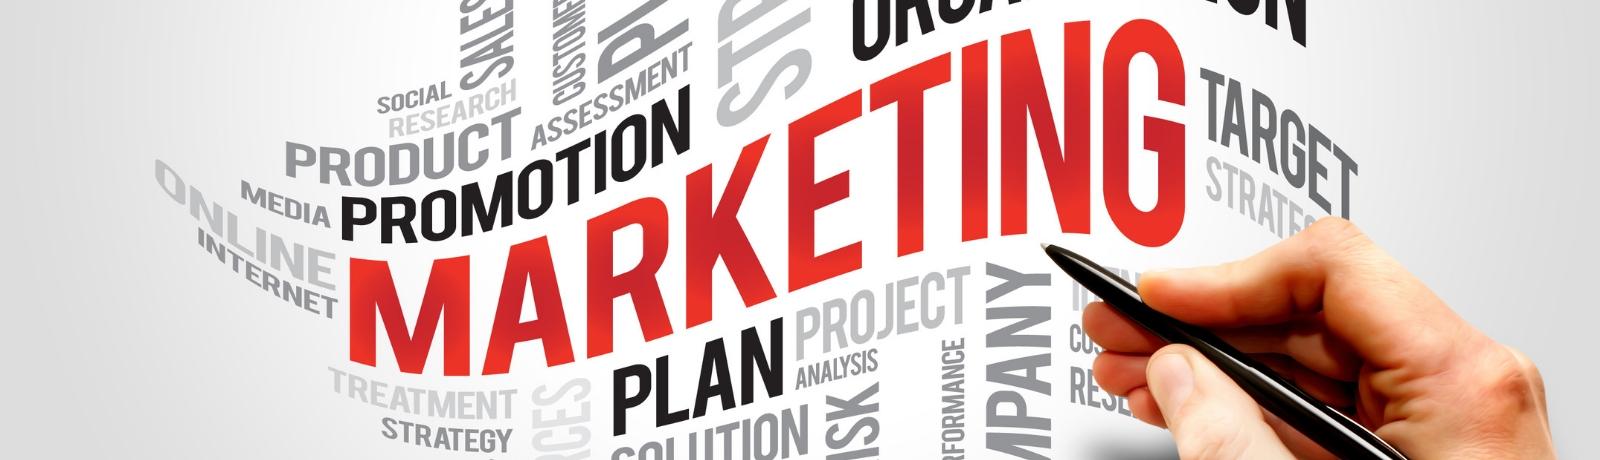 Marketing Translation Header Image